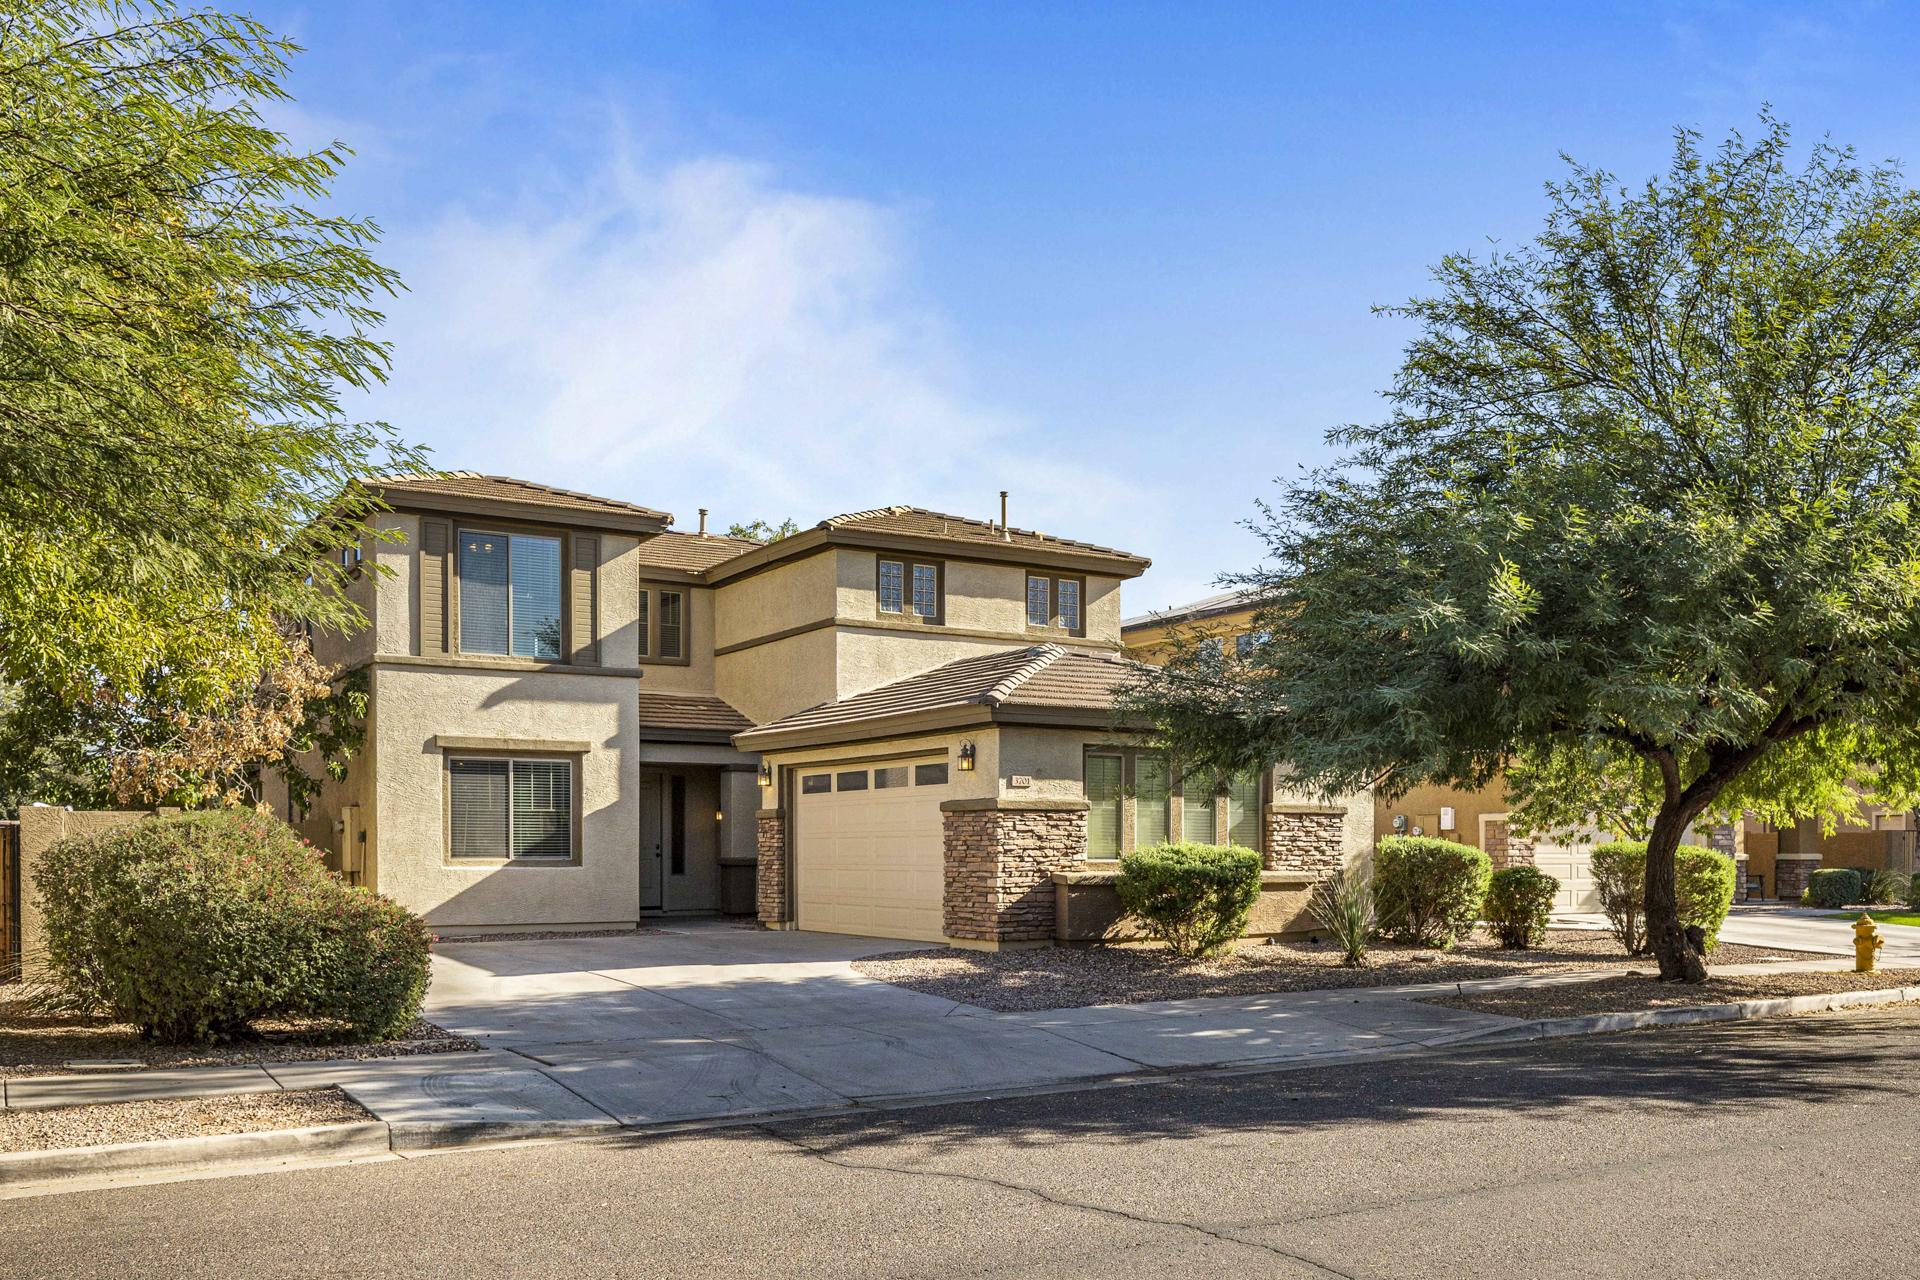 HOT LISTING - 3701 S Vineyard Ave, Gilbert, AZ 85297 - Power Ranch | Amy Jones Group